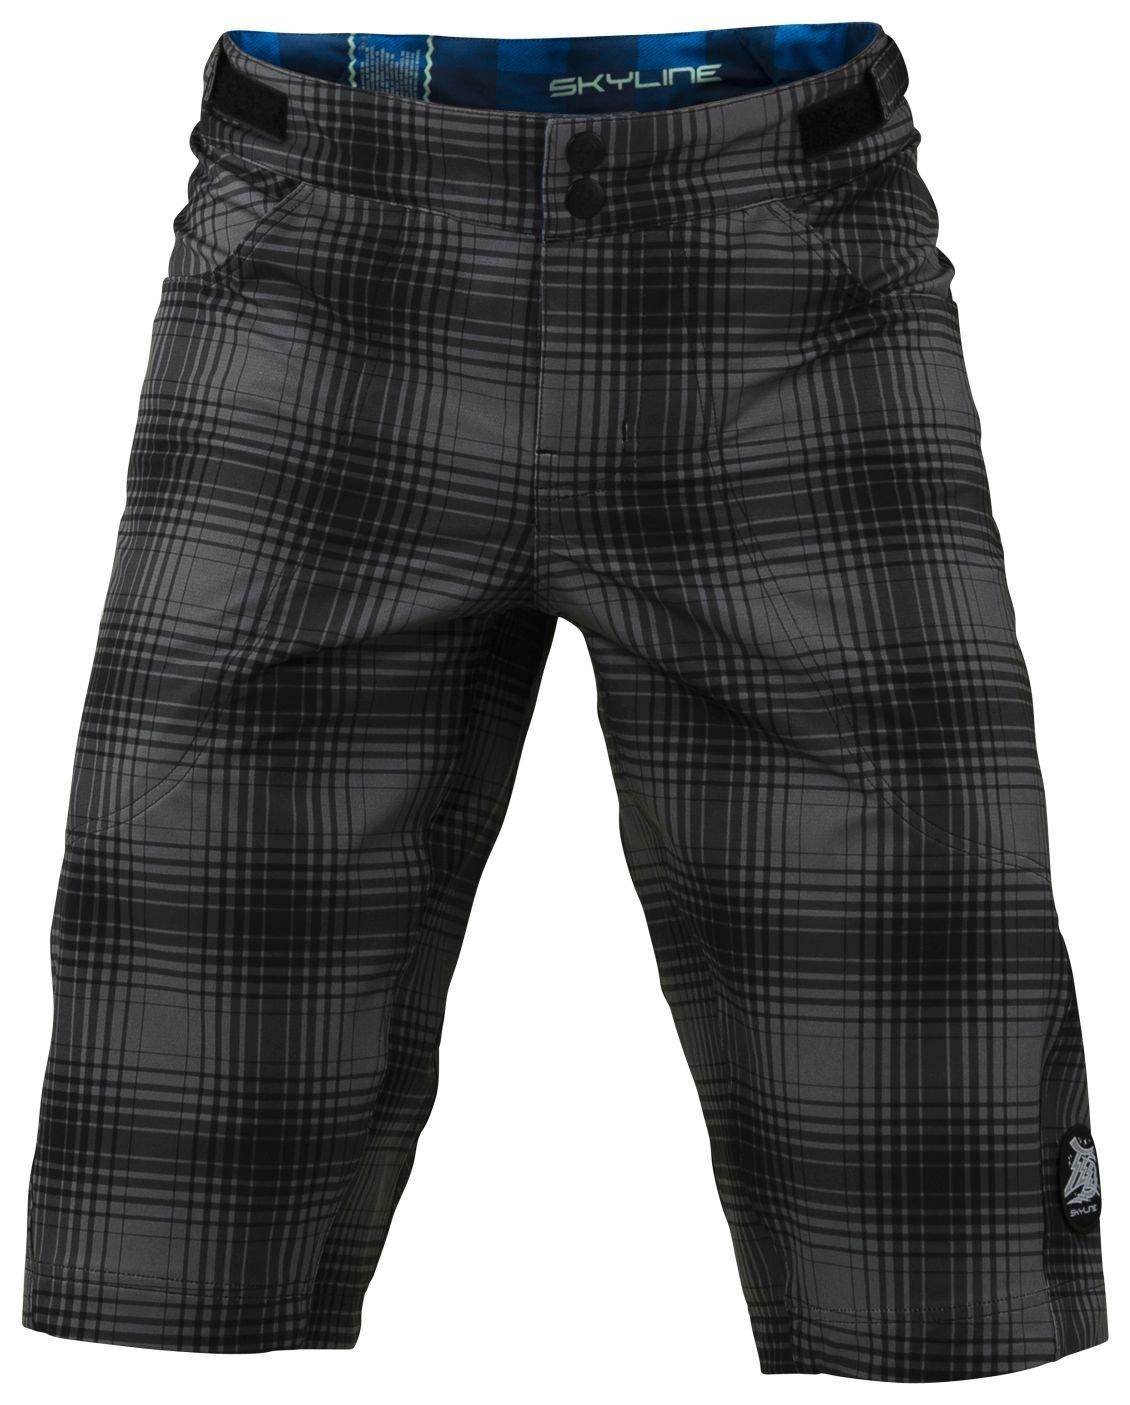 Troy Lee Designs Boys Skyline Plaid BMX Racing Short, Gray, 28